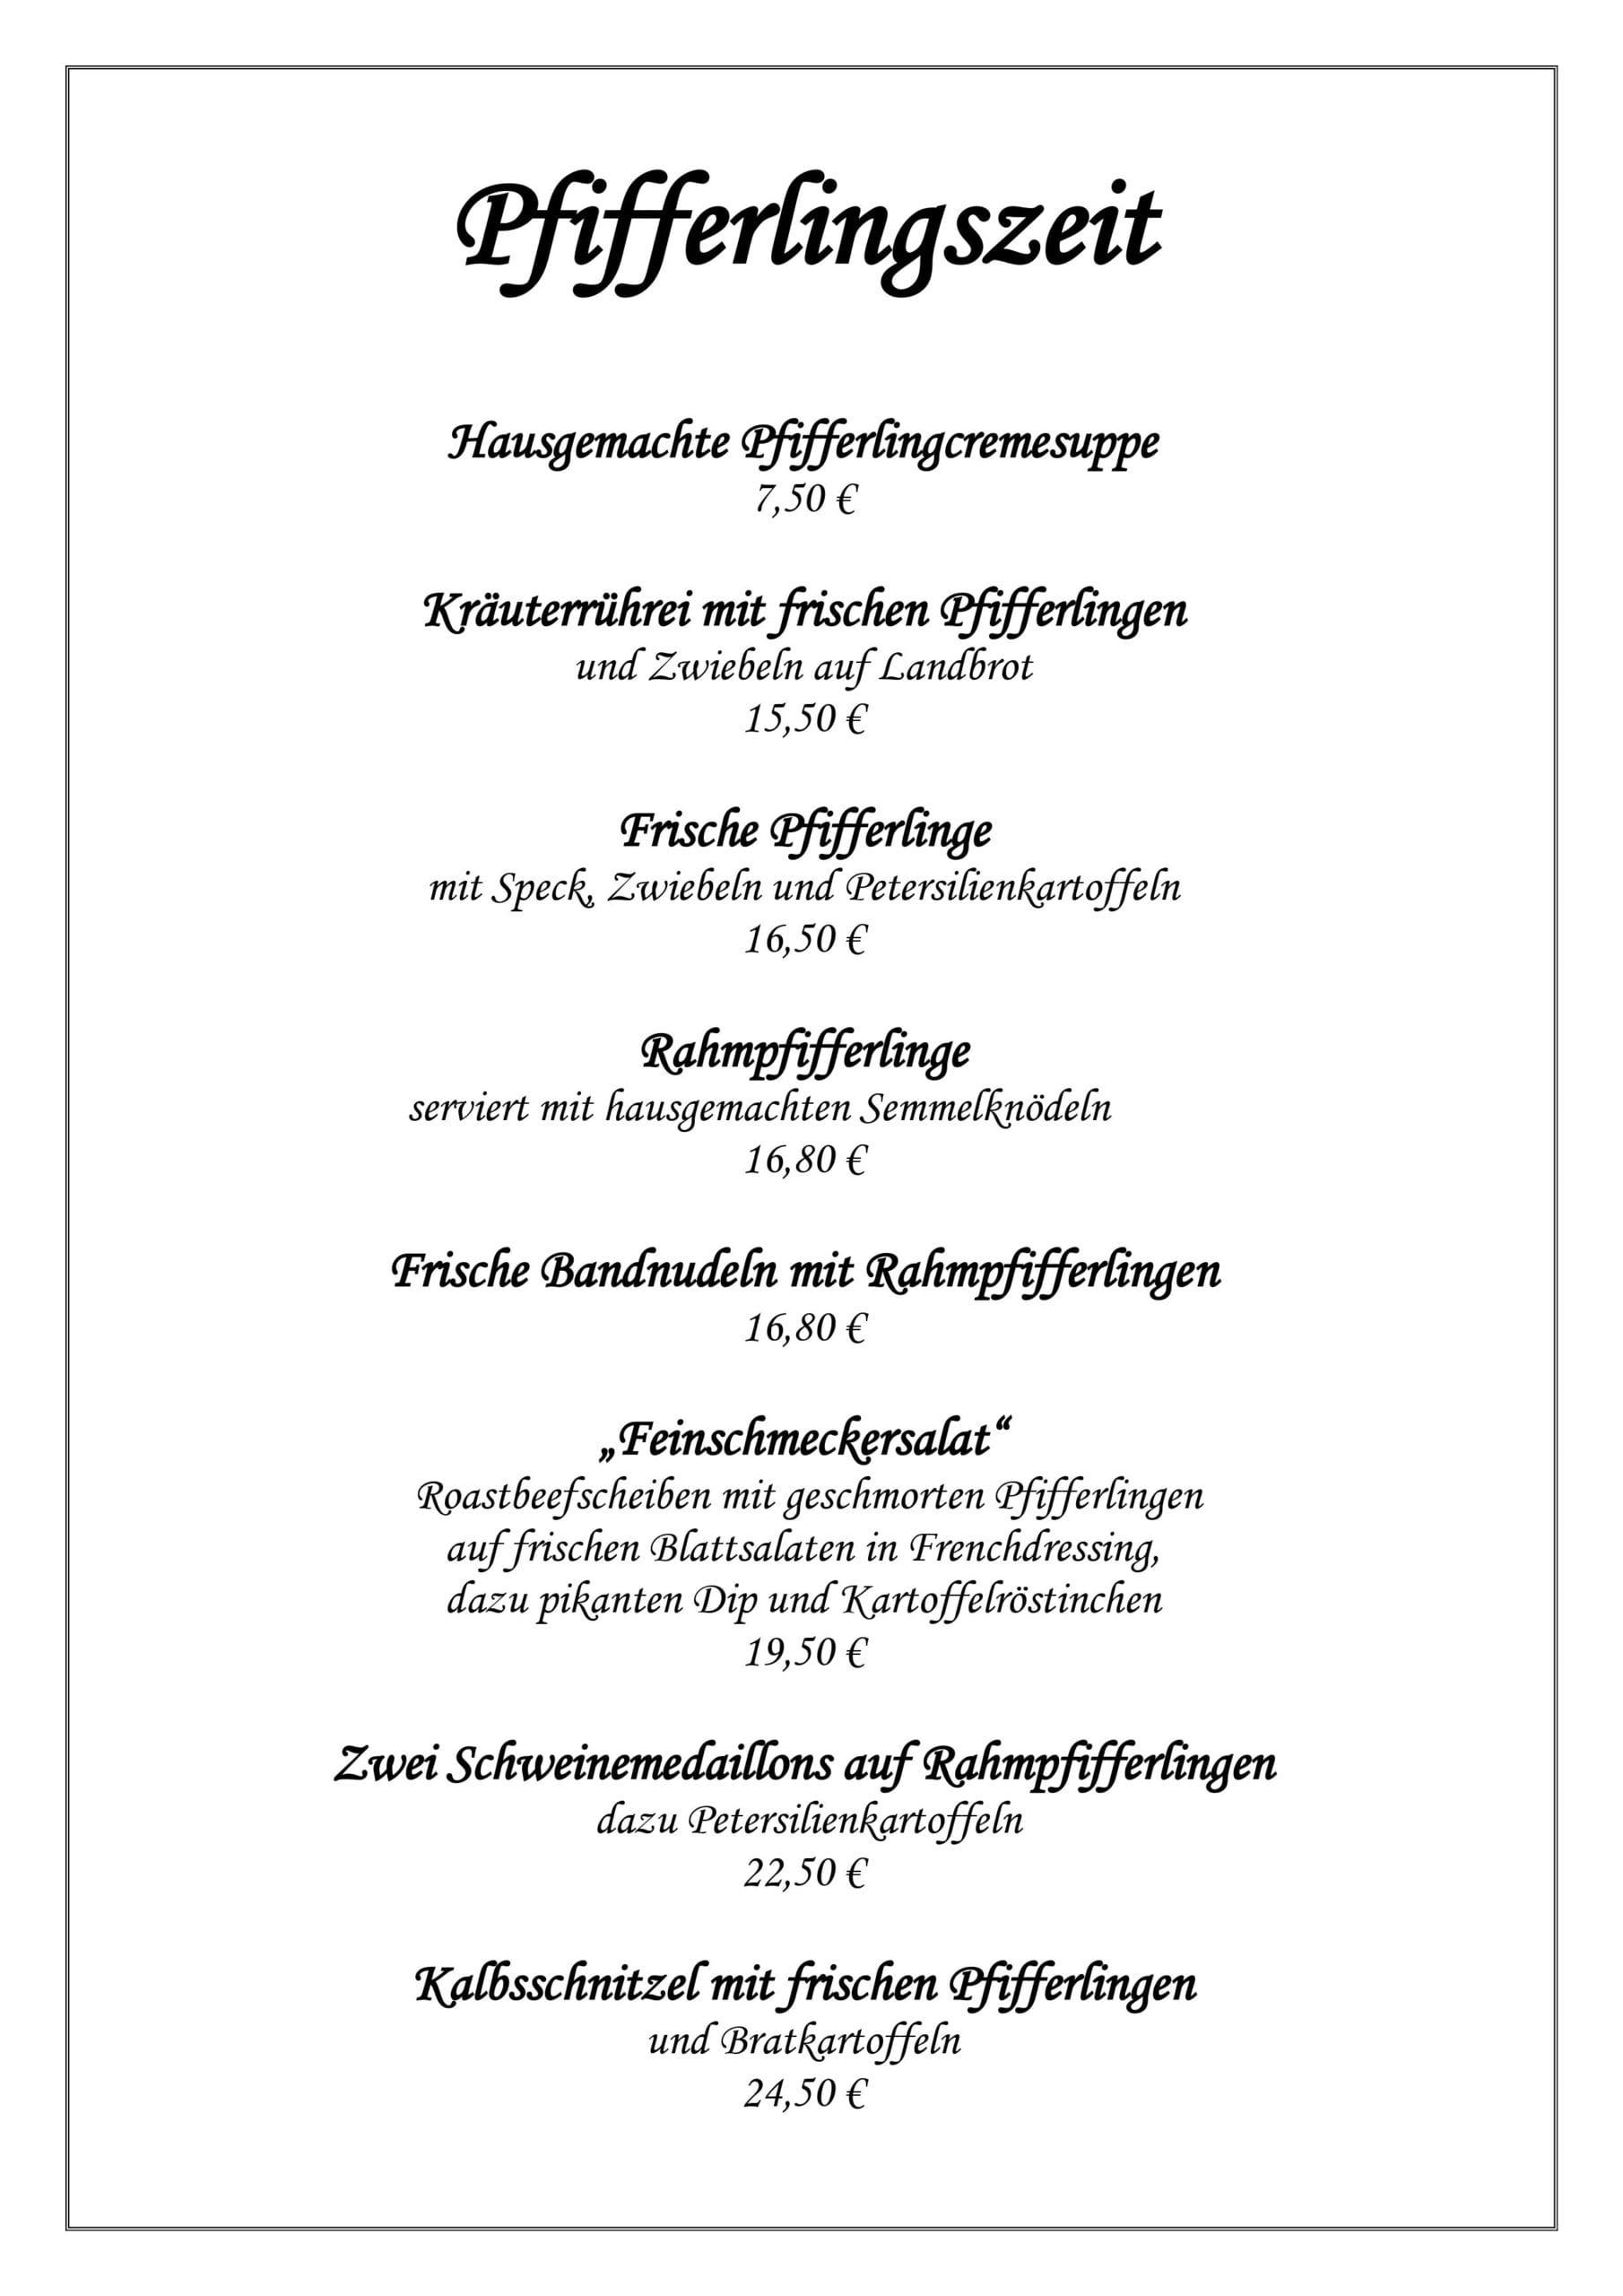 pfifferlingszeit-2021-cover